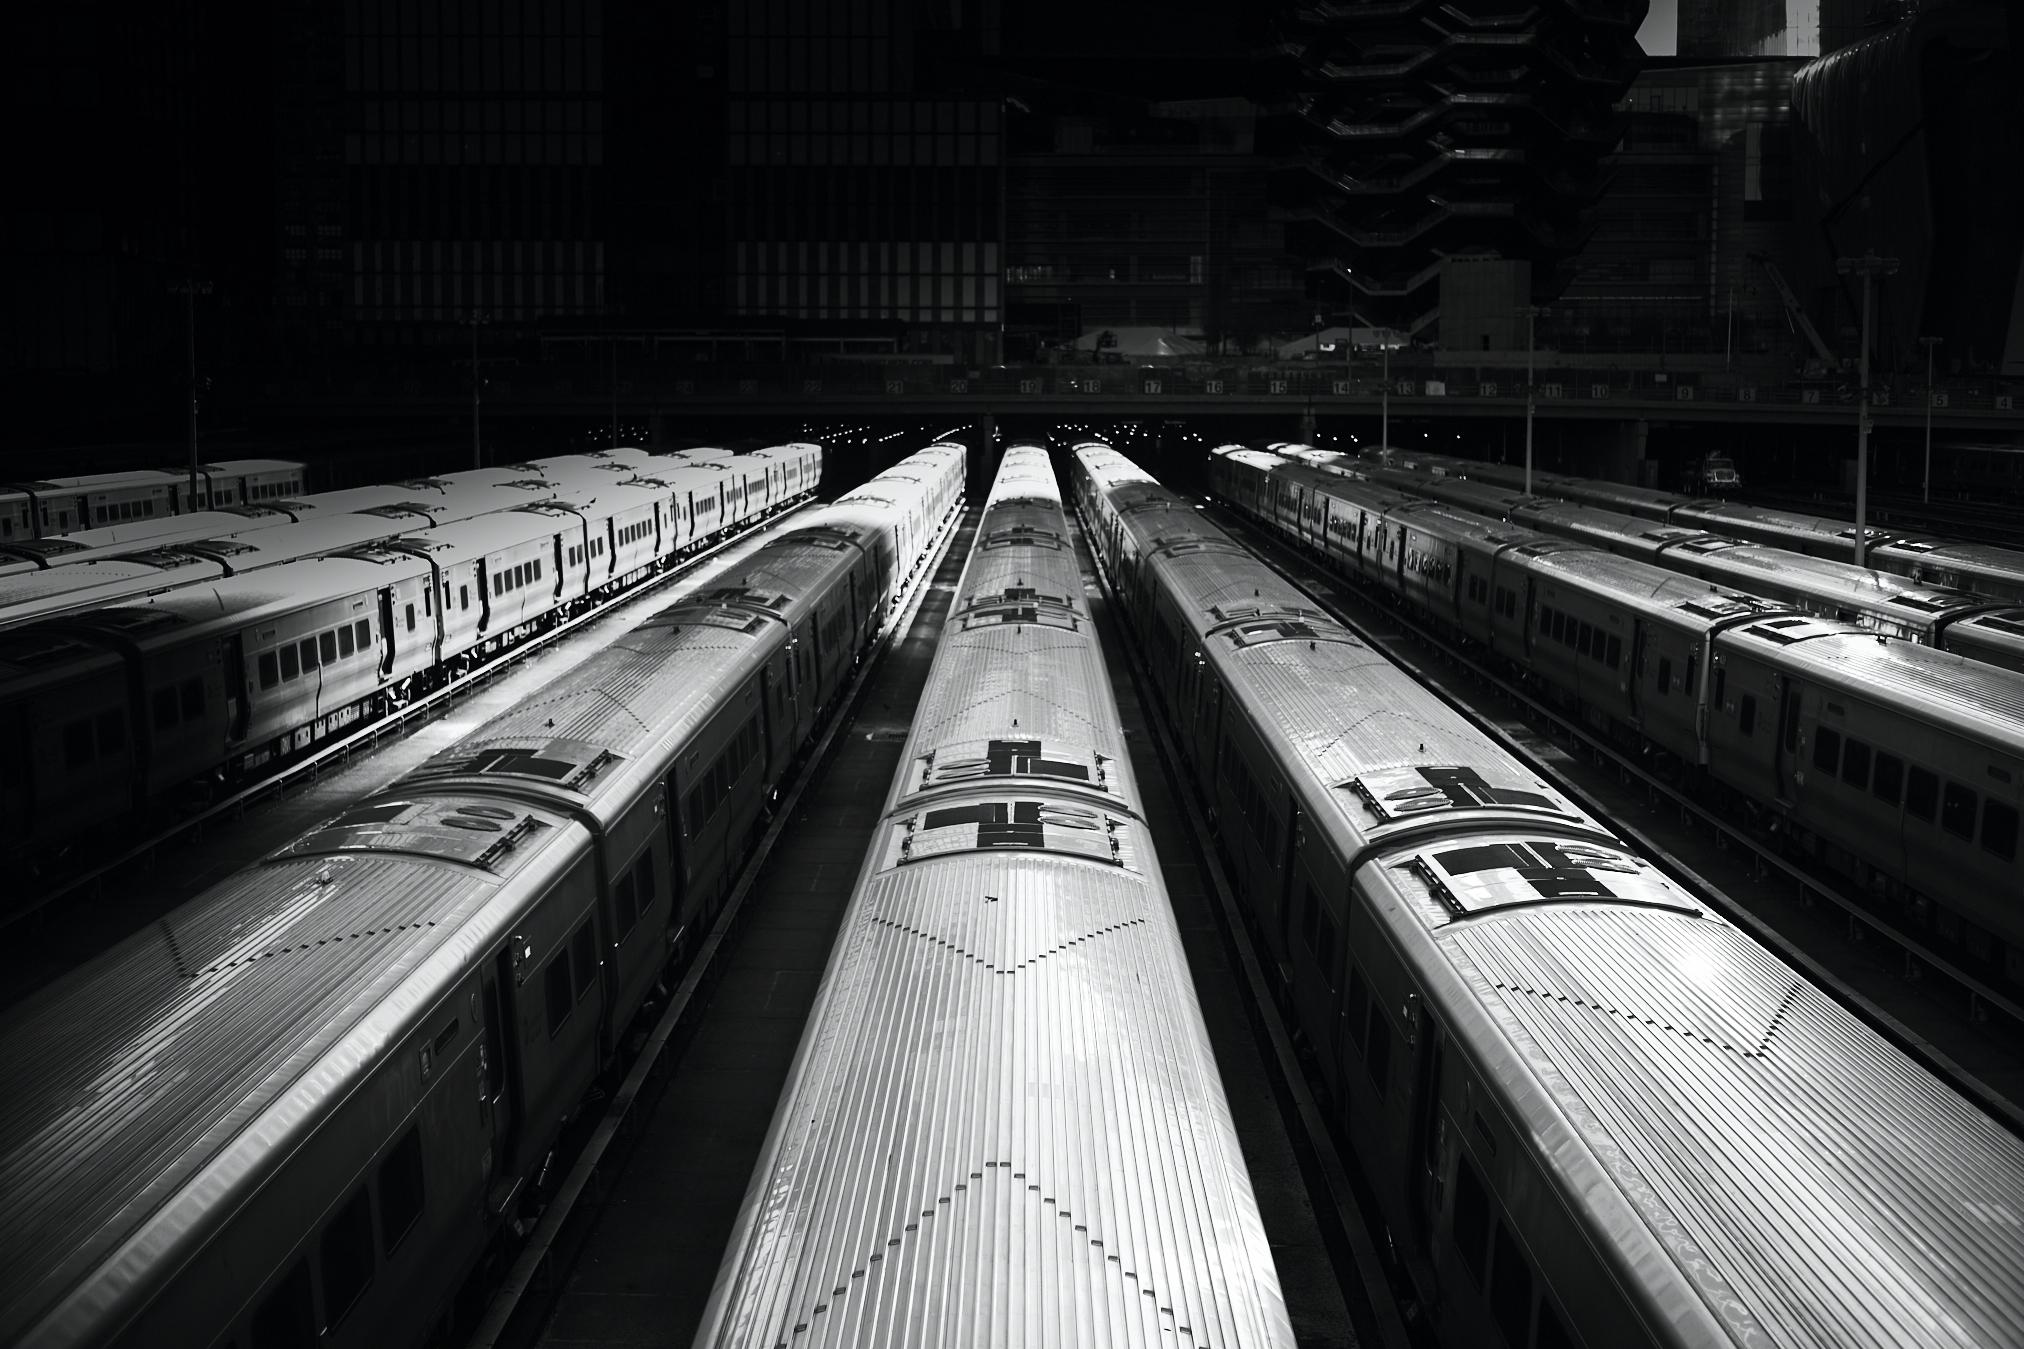 NYC_jan19 49.jpg